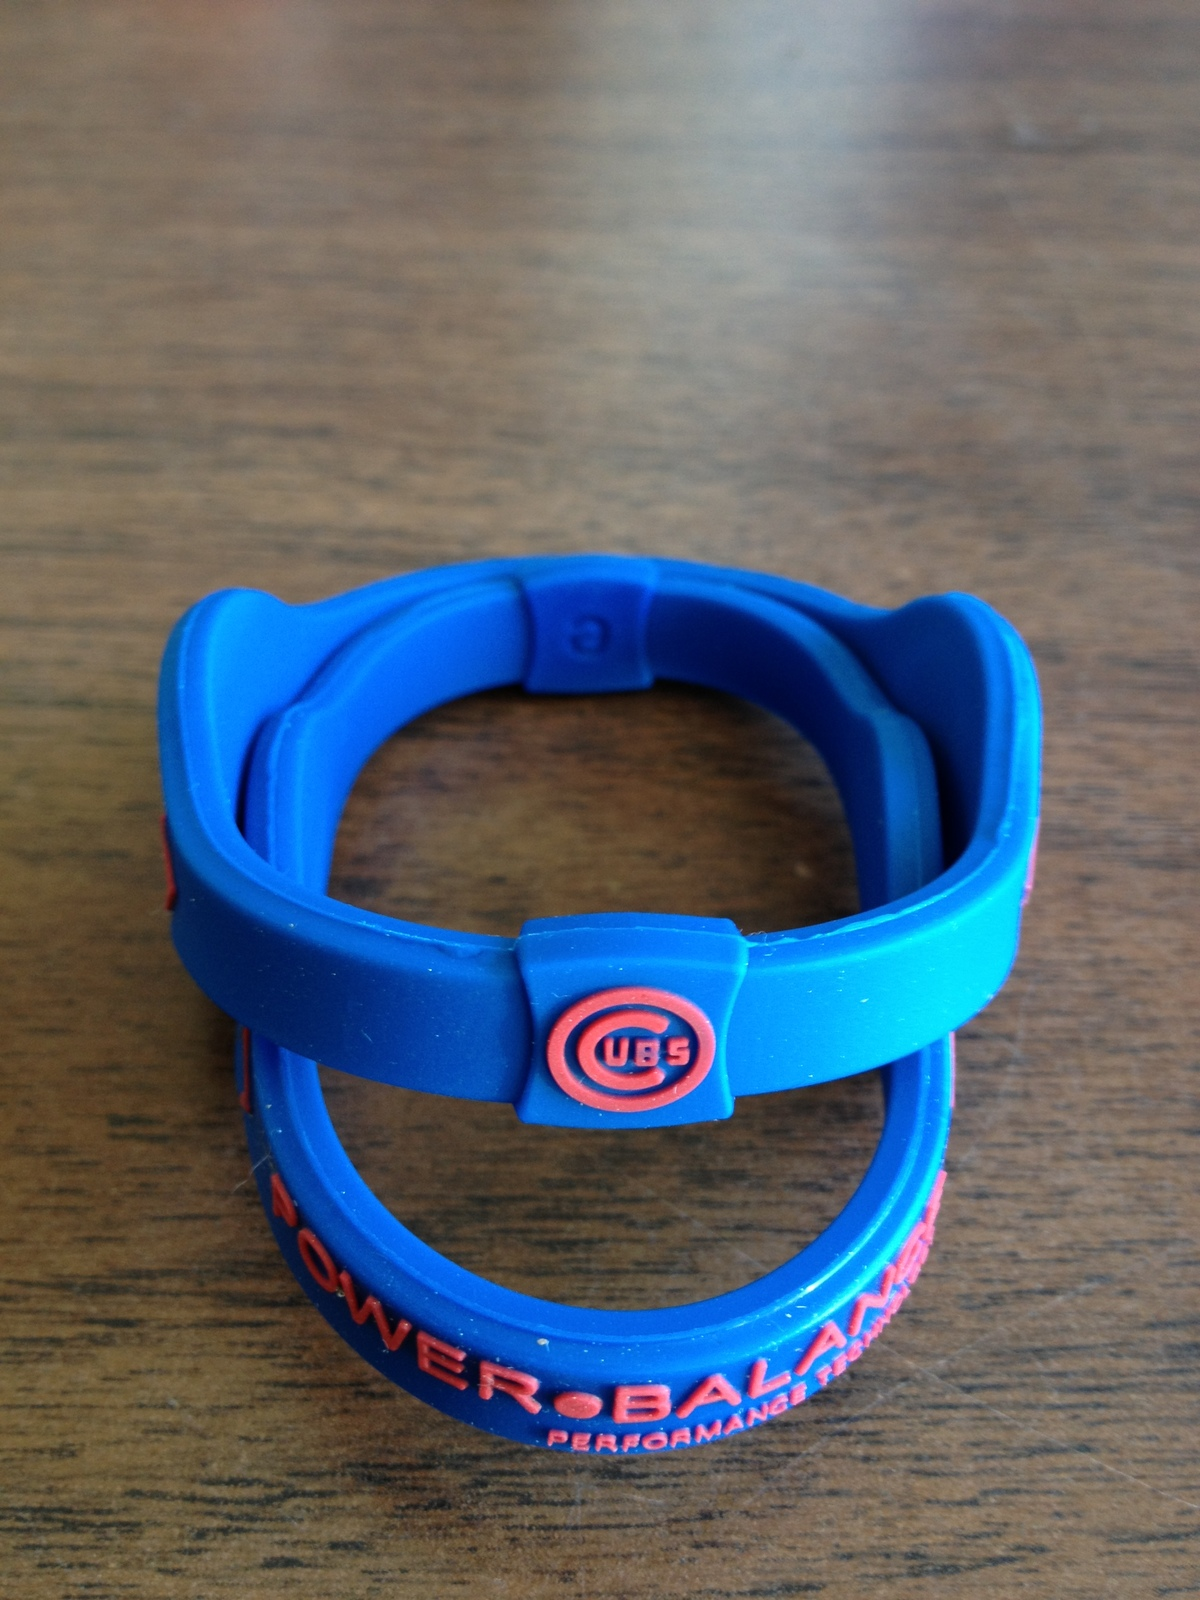 MLB Power Energy Bracelets image 7